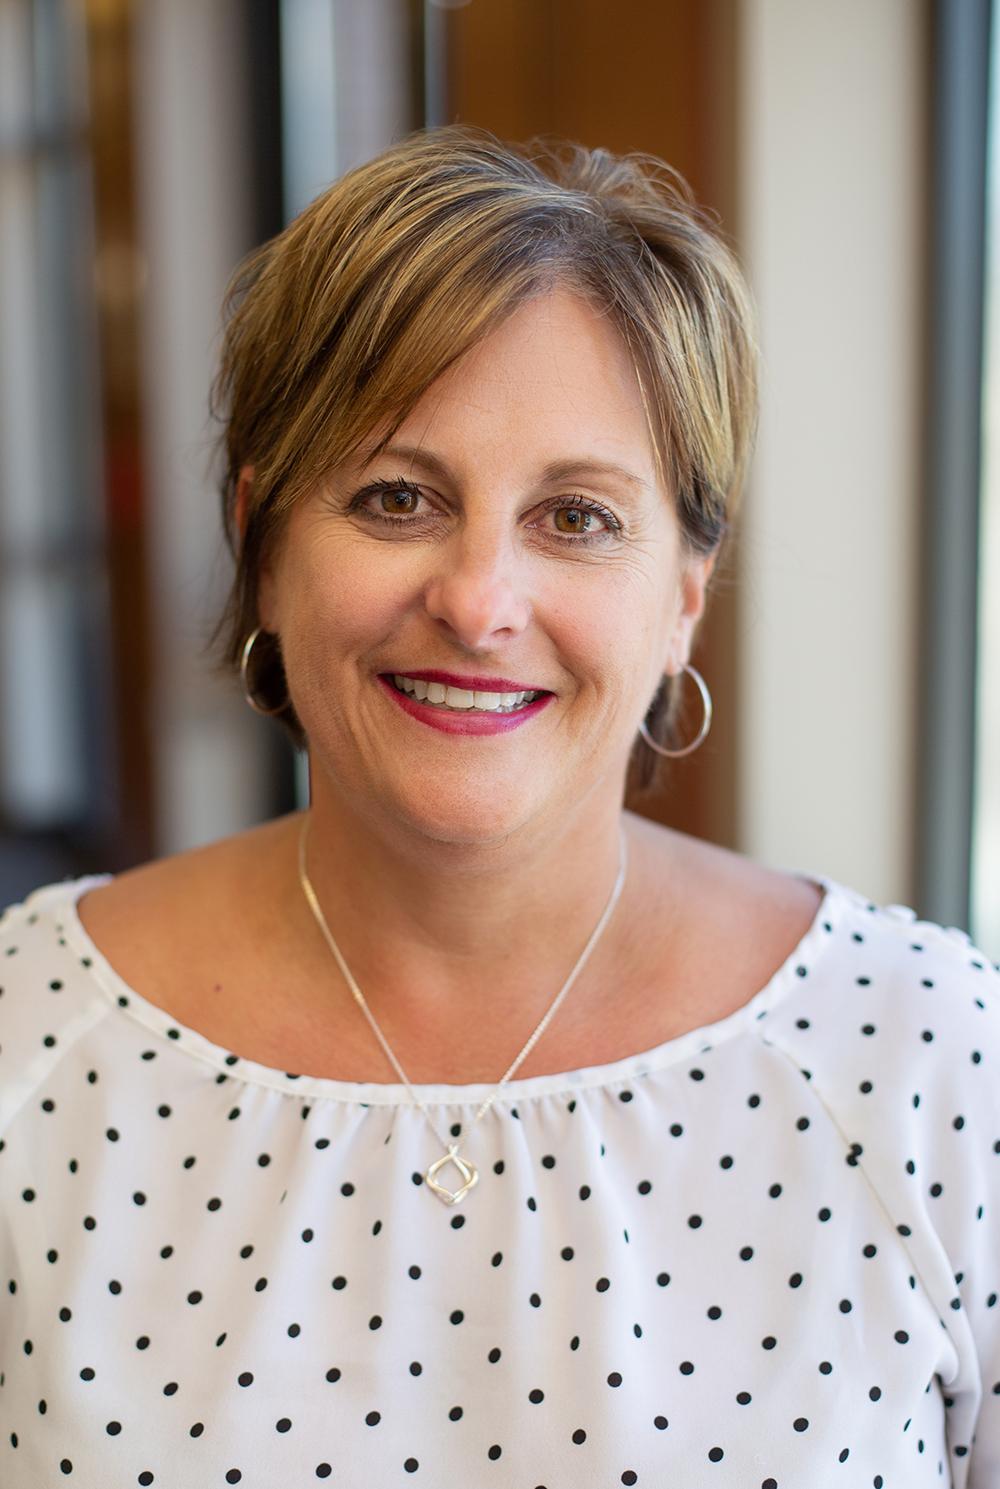 Pam Randall, RN